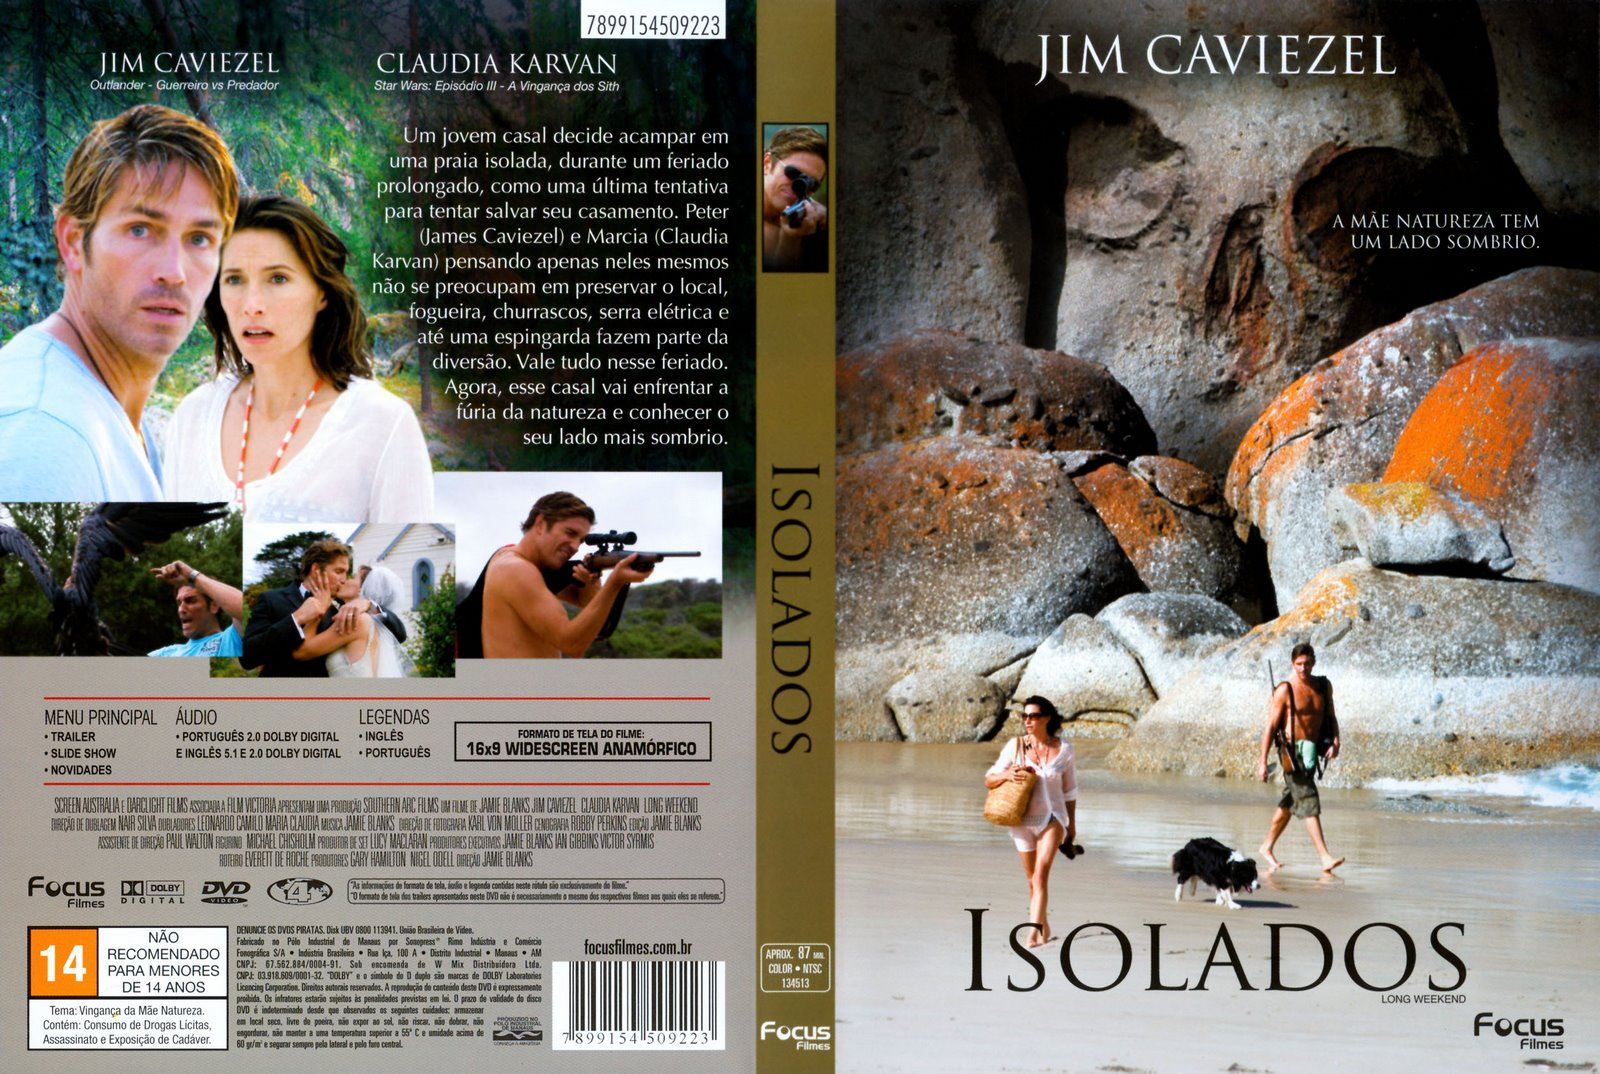 http://2.bp.blogspot.com/_56N_enXK-4o/TEcHXkEO88I/AAAAAAAAAJk/-ZxffzXX7kI/s1600/Isolados.jpg